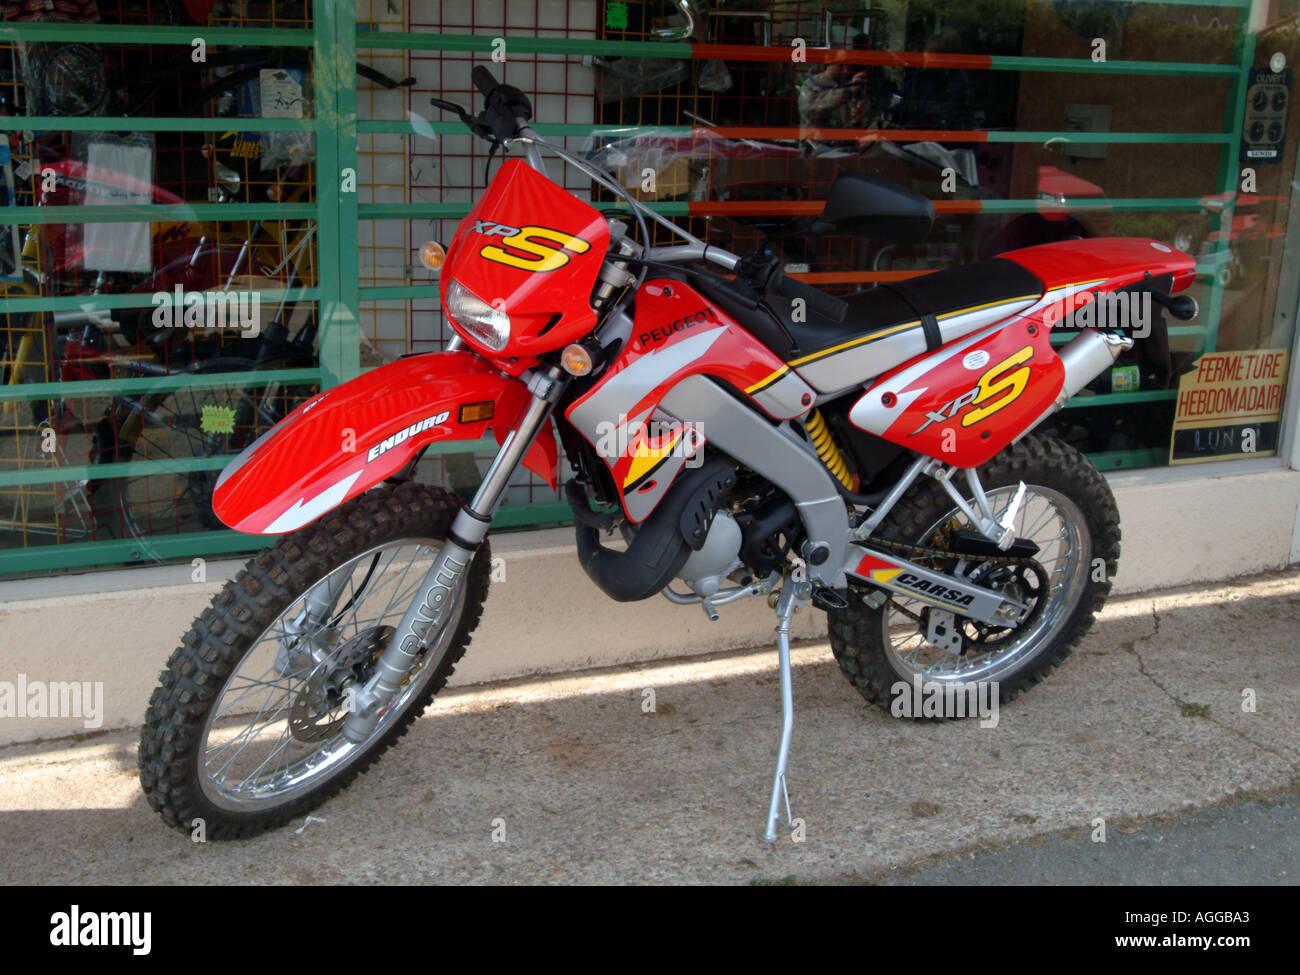 Brand new motorbike in France - Stock Image